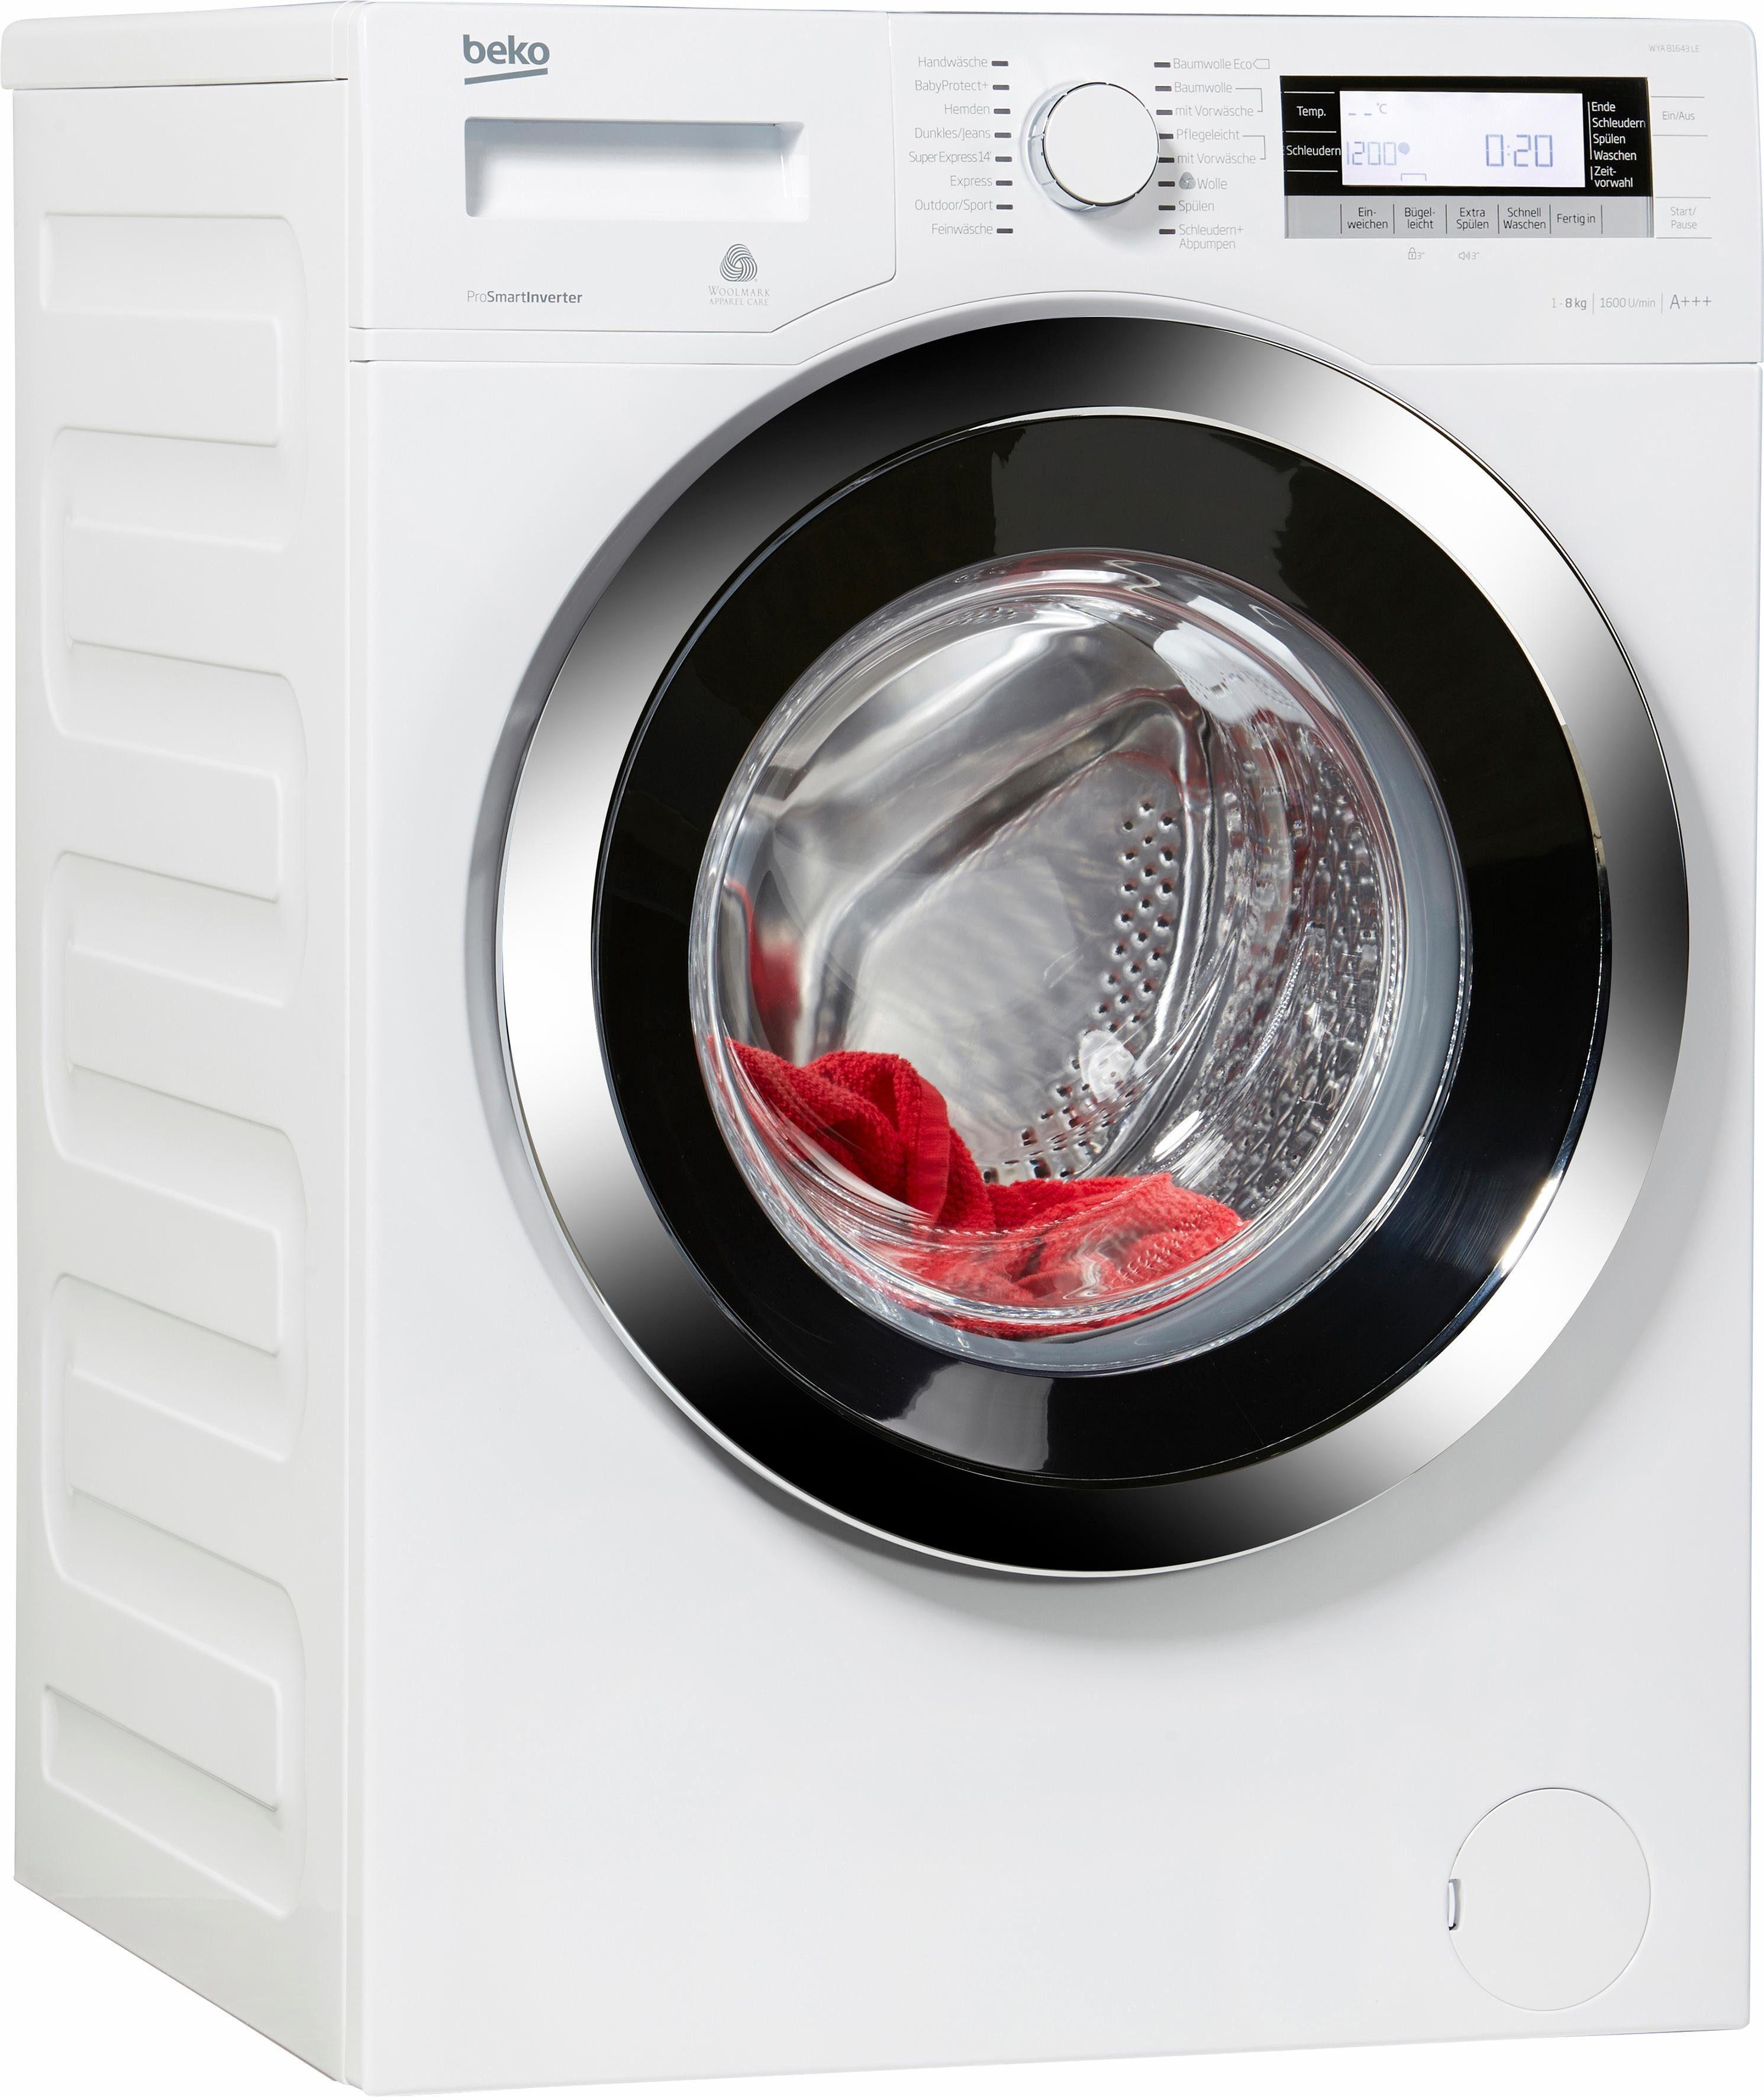 BEKO Waschmaschine WYA 81643 LE, A+++, 8 kg, 1600 U/Min